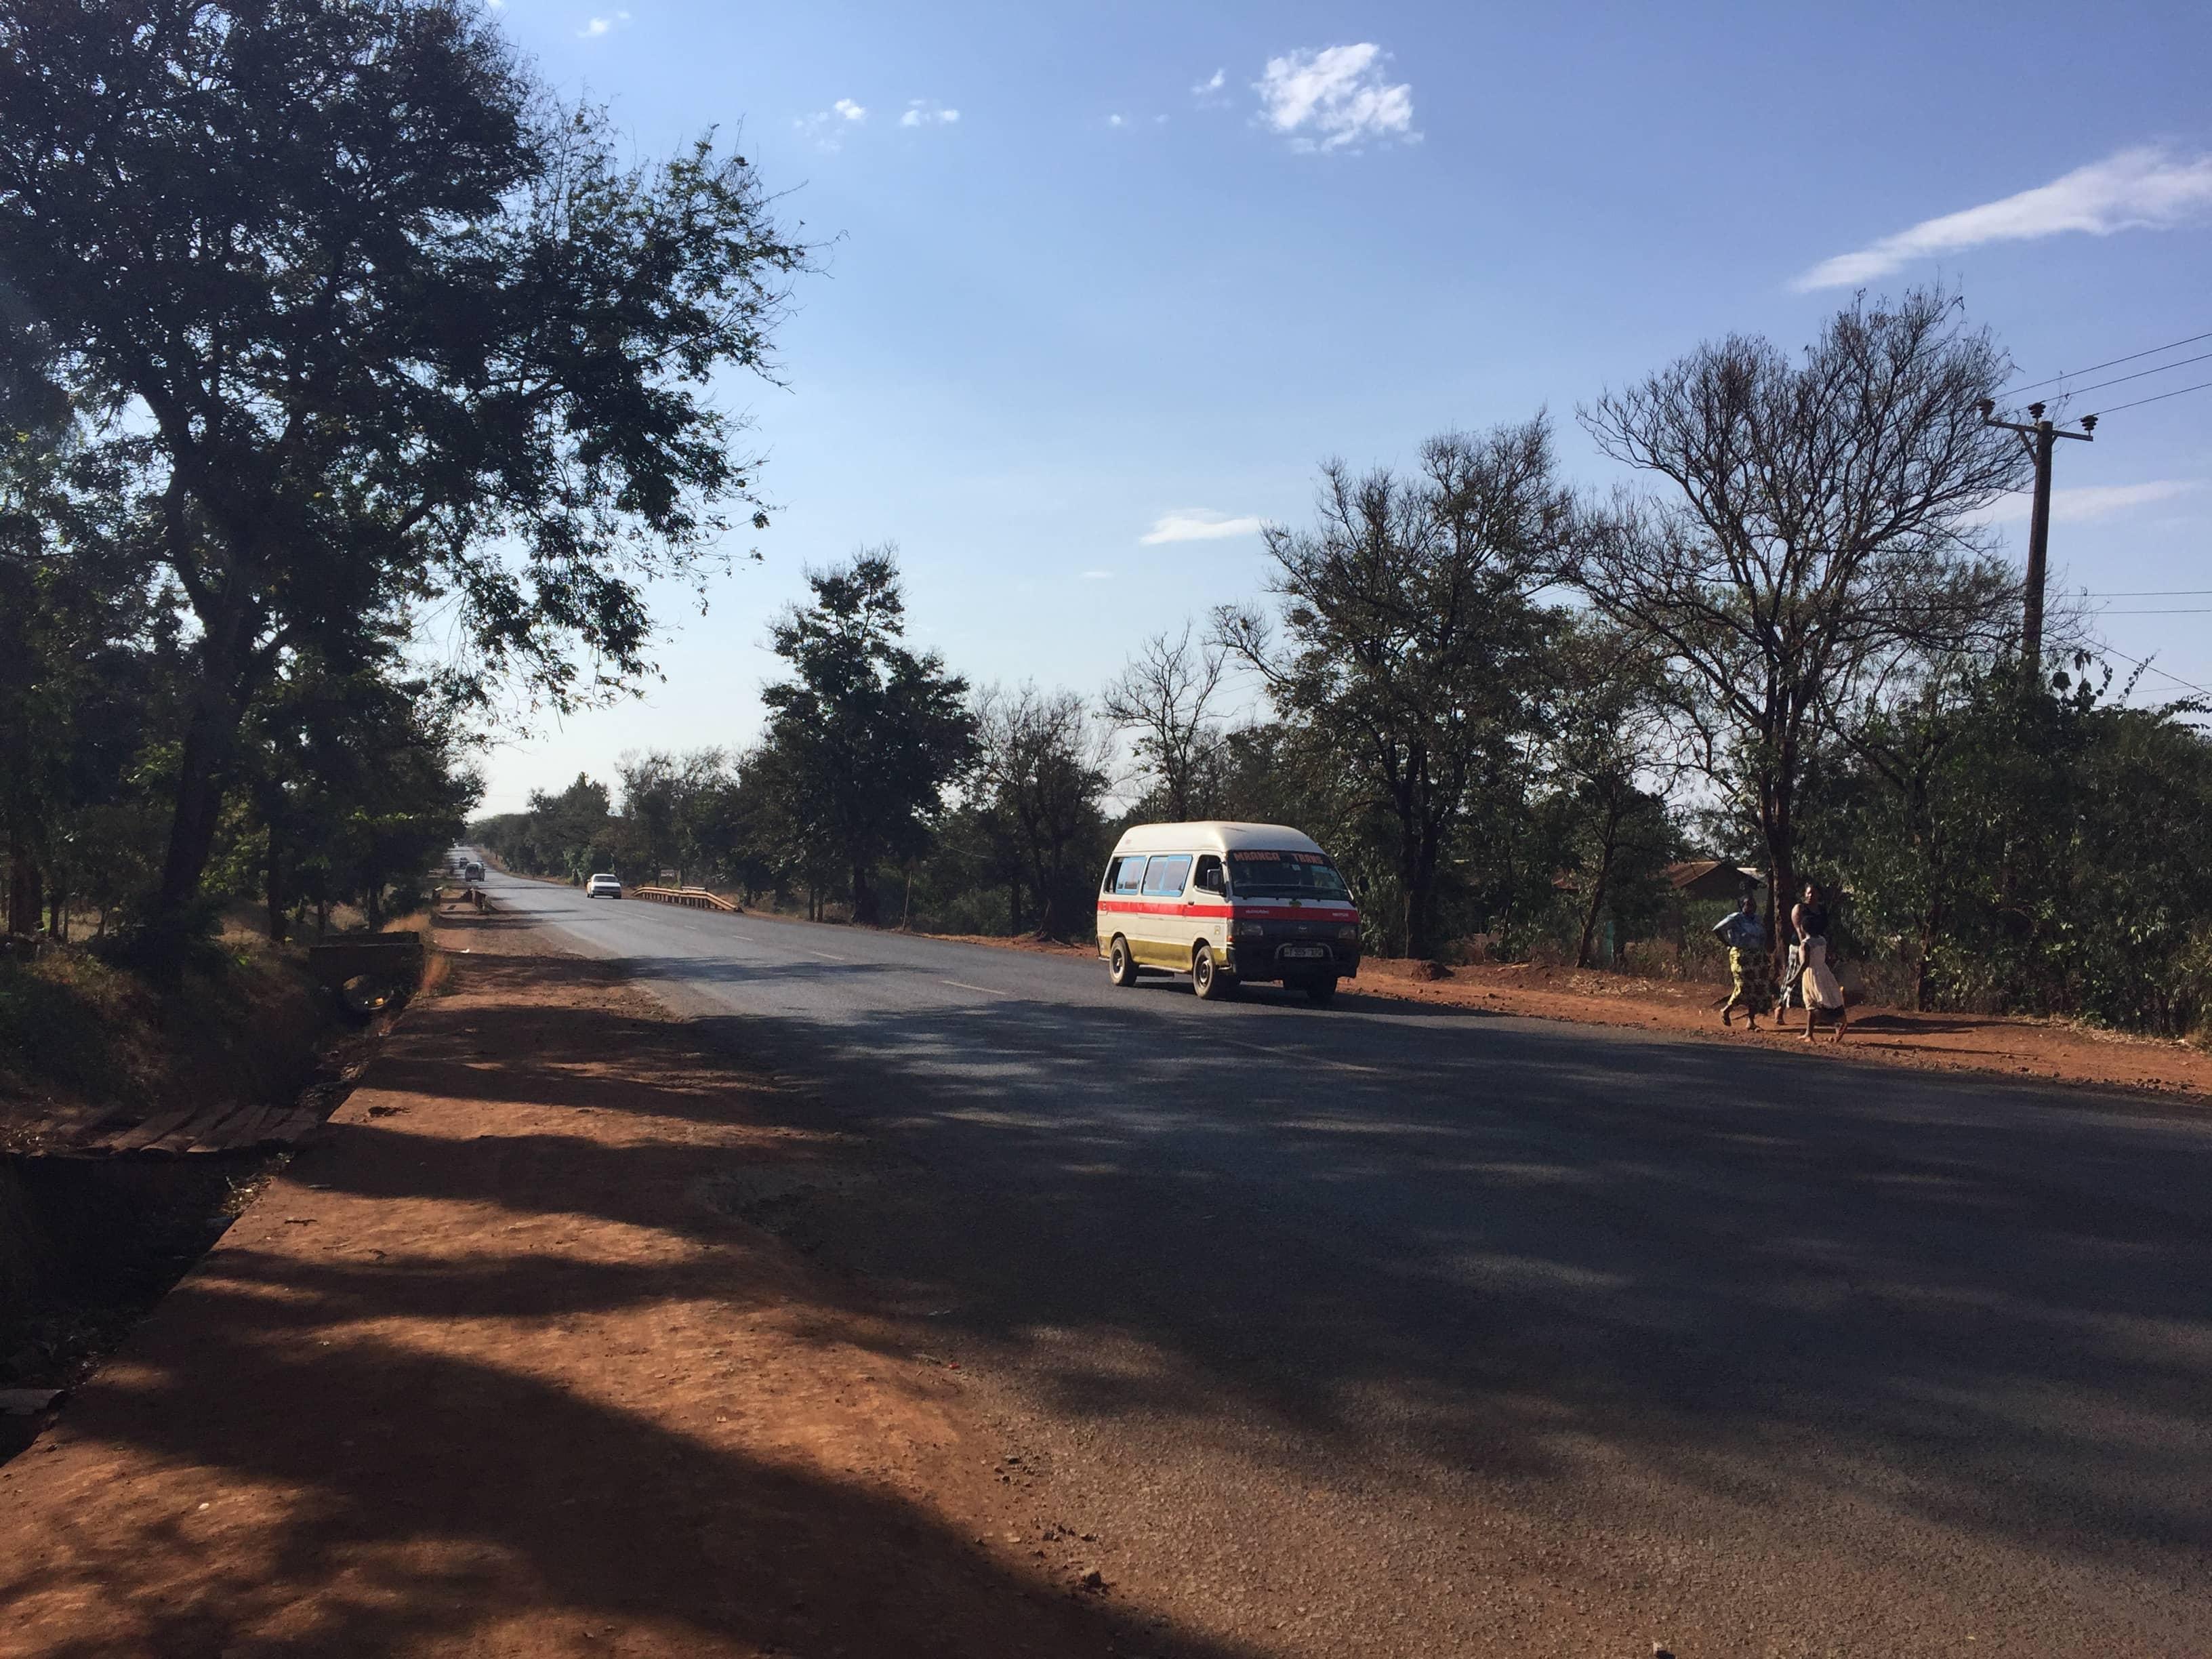 Fred's Kilimanjaro Journey 1